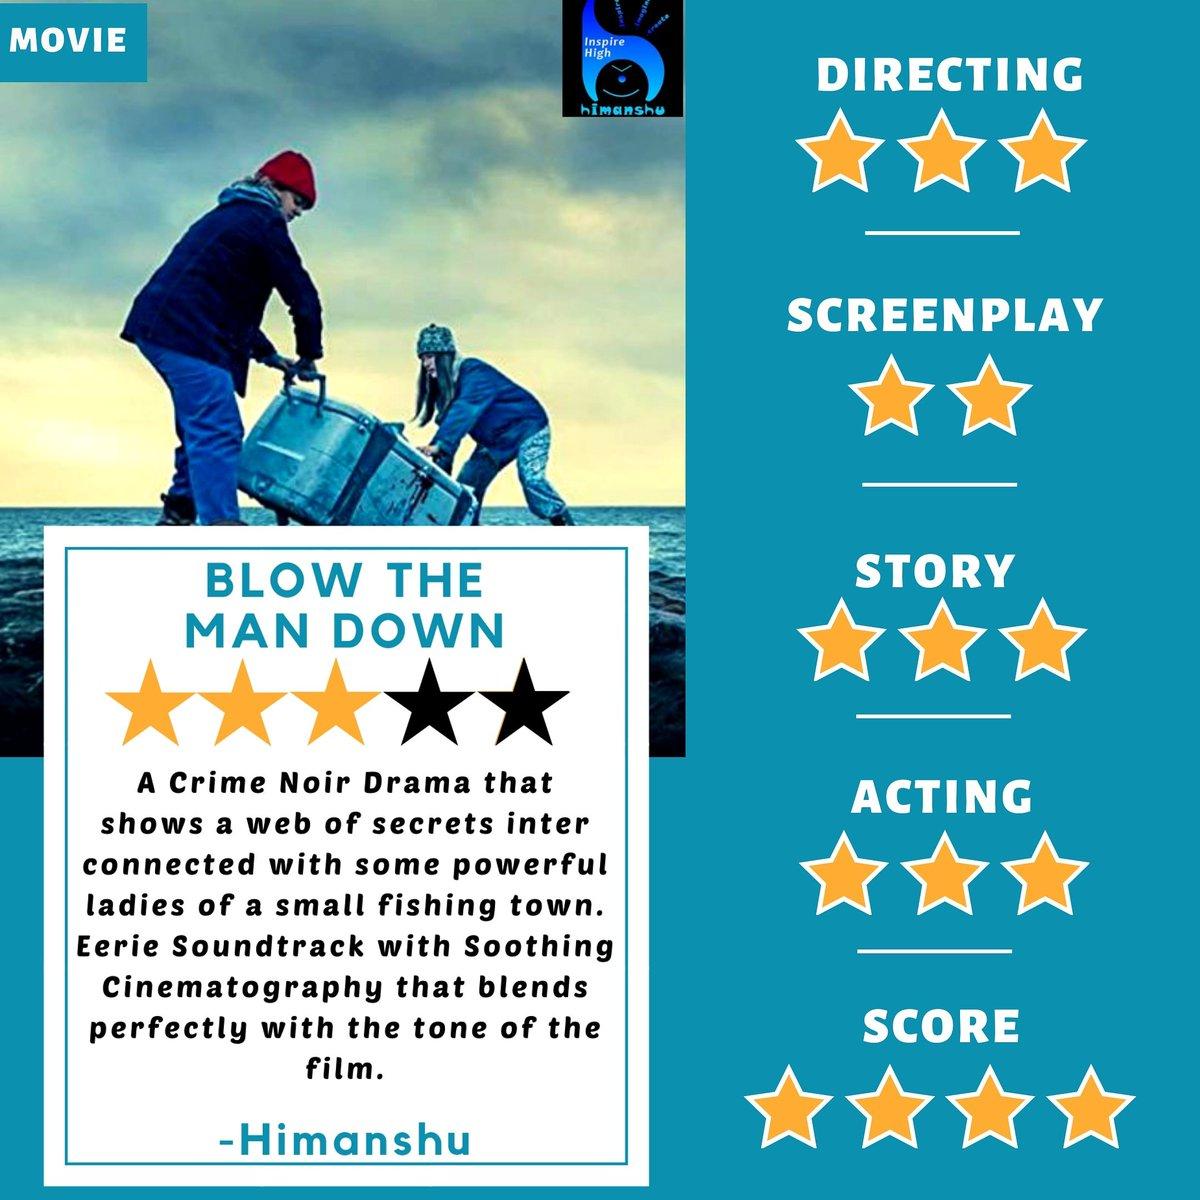 Blow the Man Down (2020) - Rapid Review by Himanshu | Him Rating: 3/5   #blowthemandown #blowmandownmovie #dramamovie #moviefan #horrormovies #movie #moviereviews #review #inspirehighblog #amazonprimevideopic.twitter.com/ffjaF3sMfD